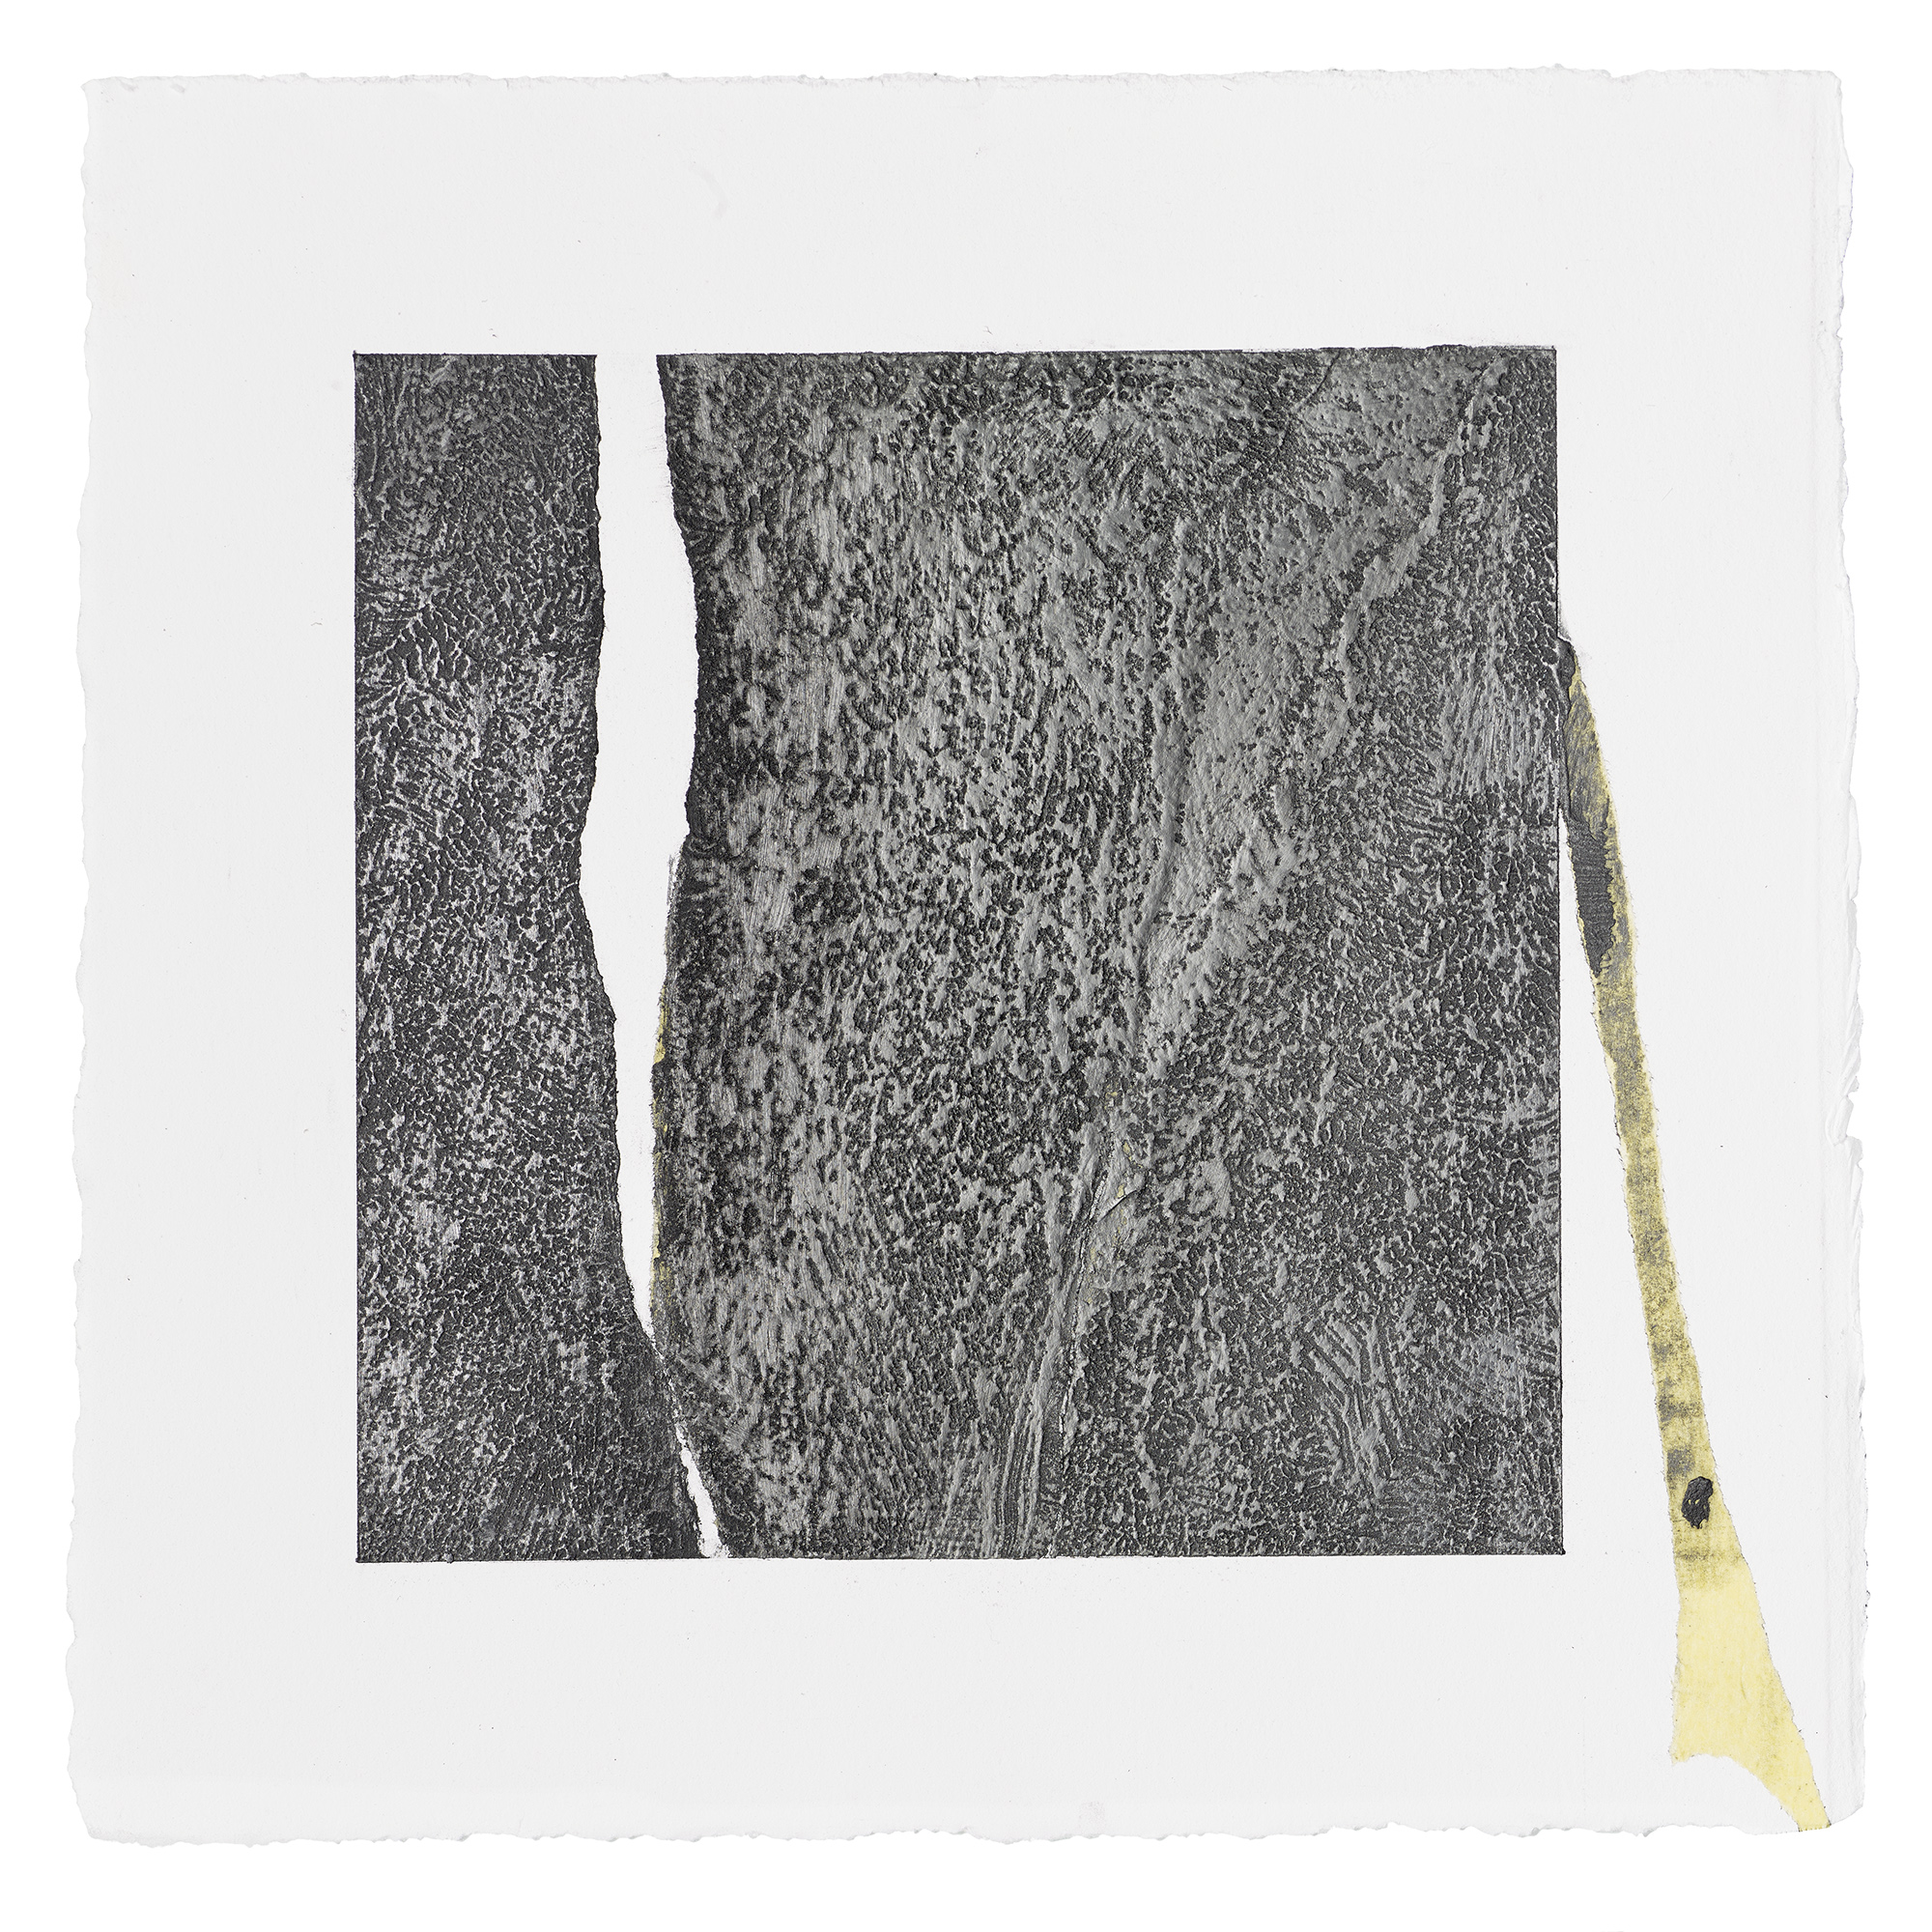 "ML61, peach pit soot, rabbit skin glue, graphite, 10.5""x10.5"" paper, 2016"